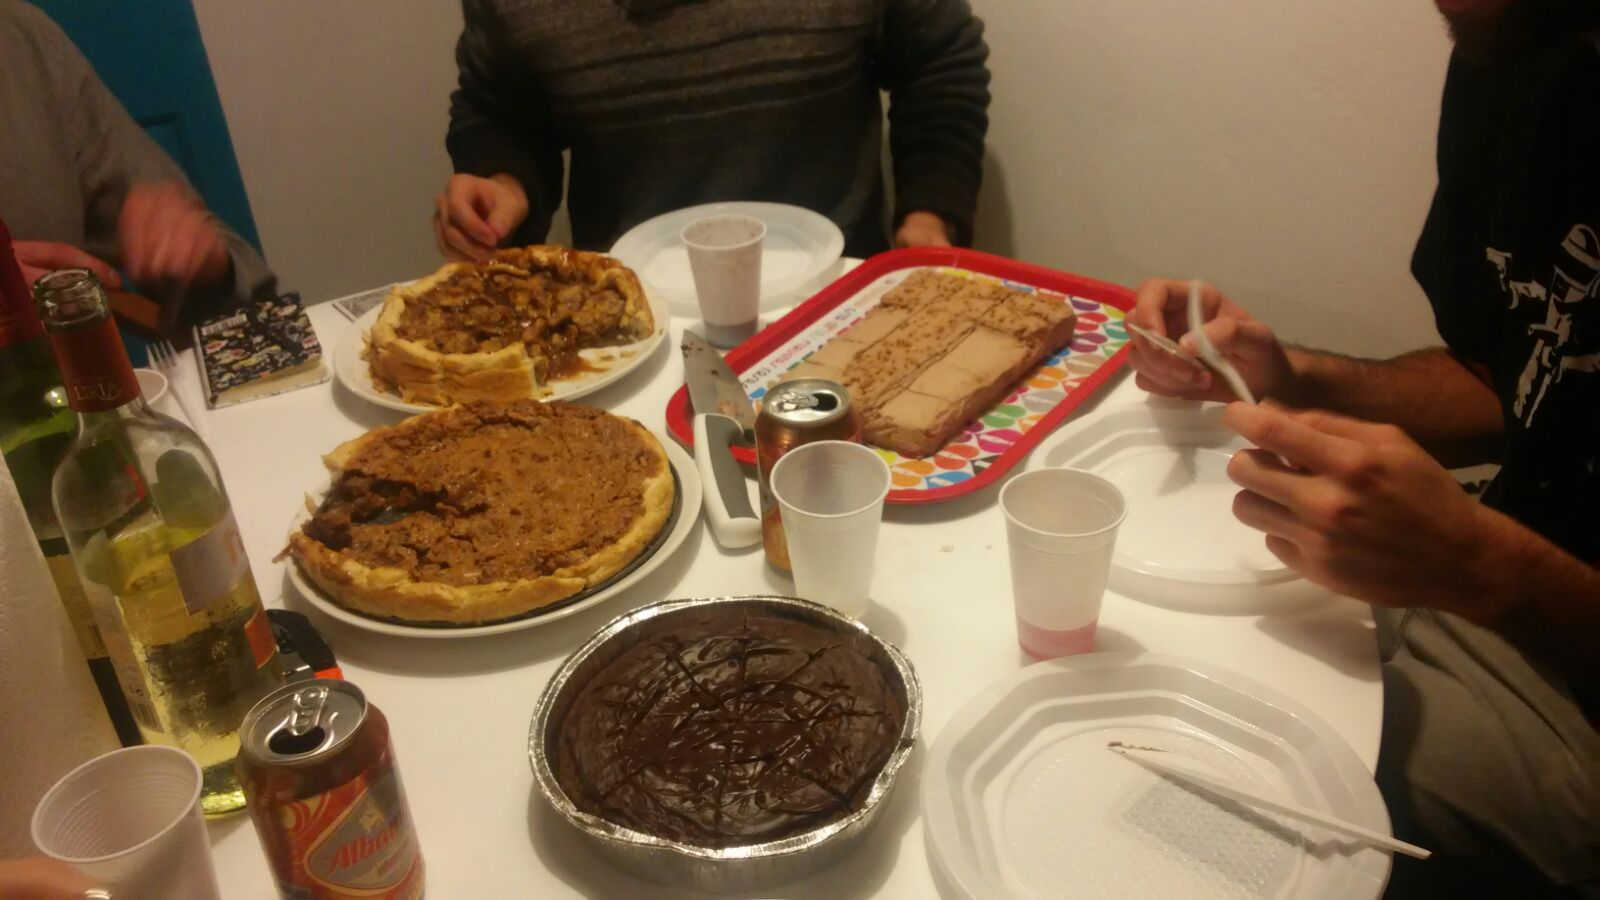 turkeyday  IMG-20151127-WA0004.jpg